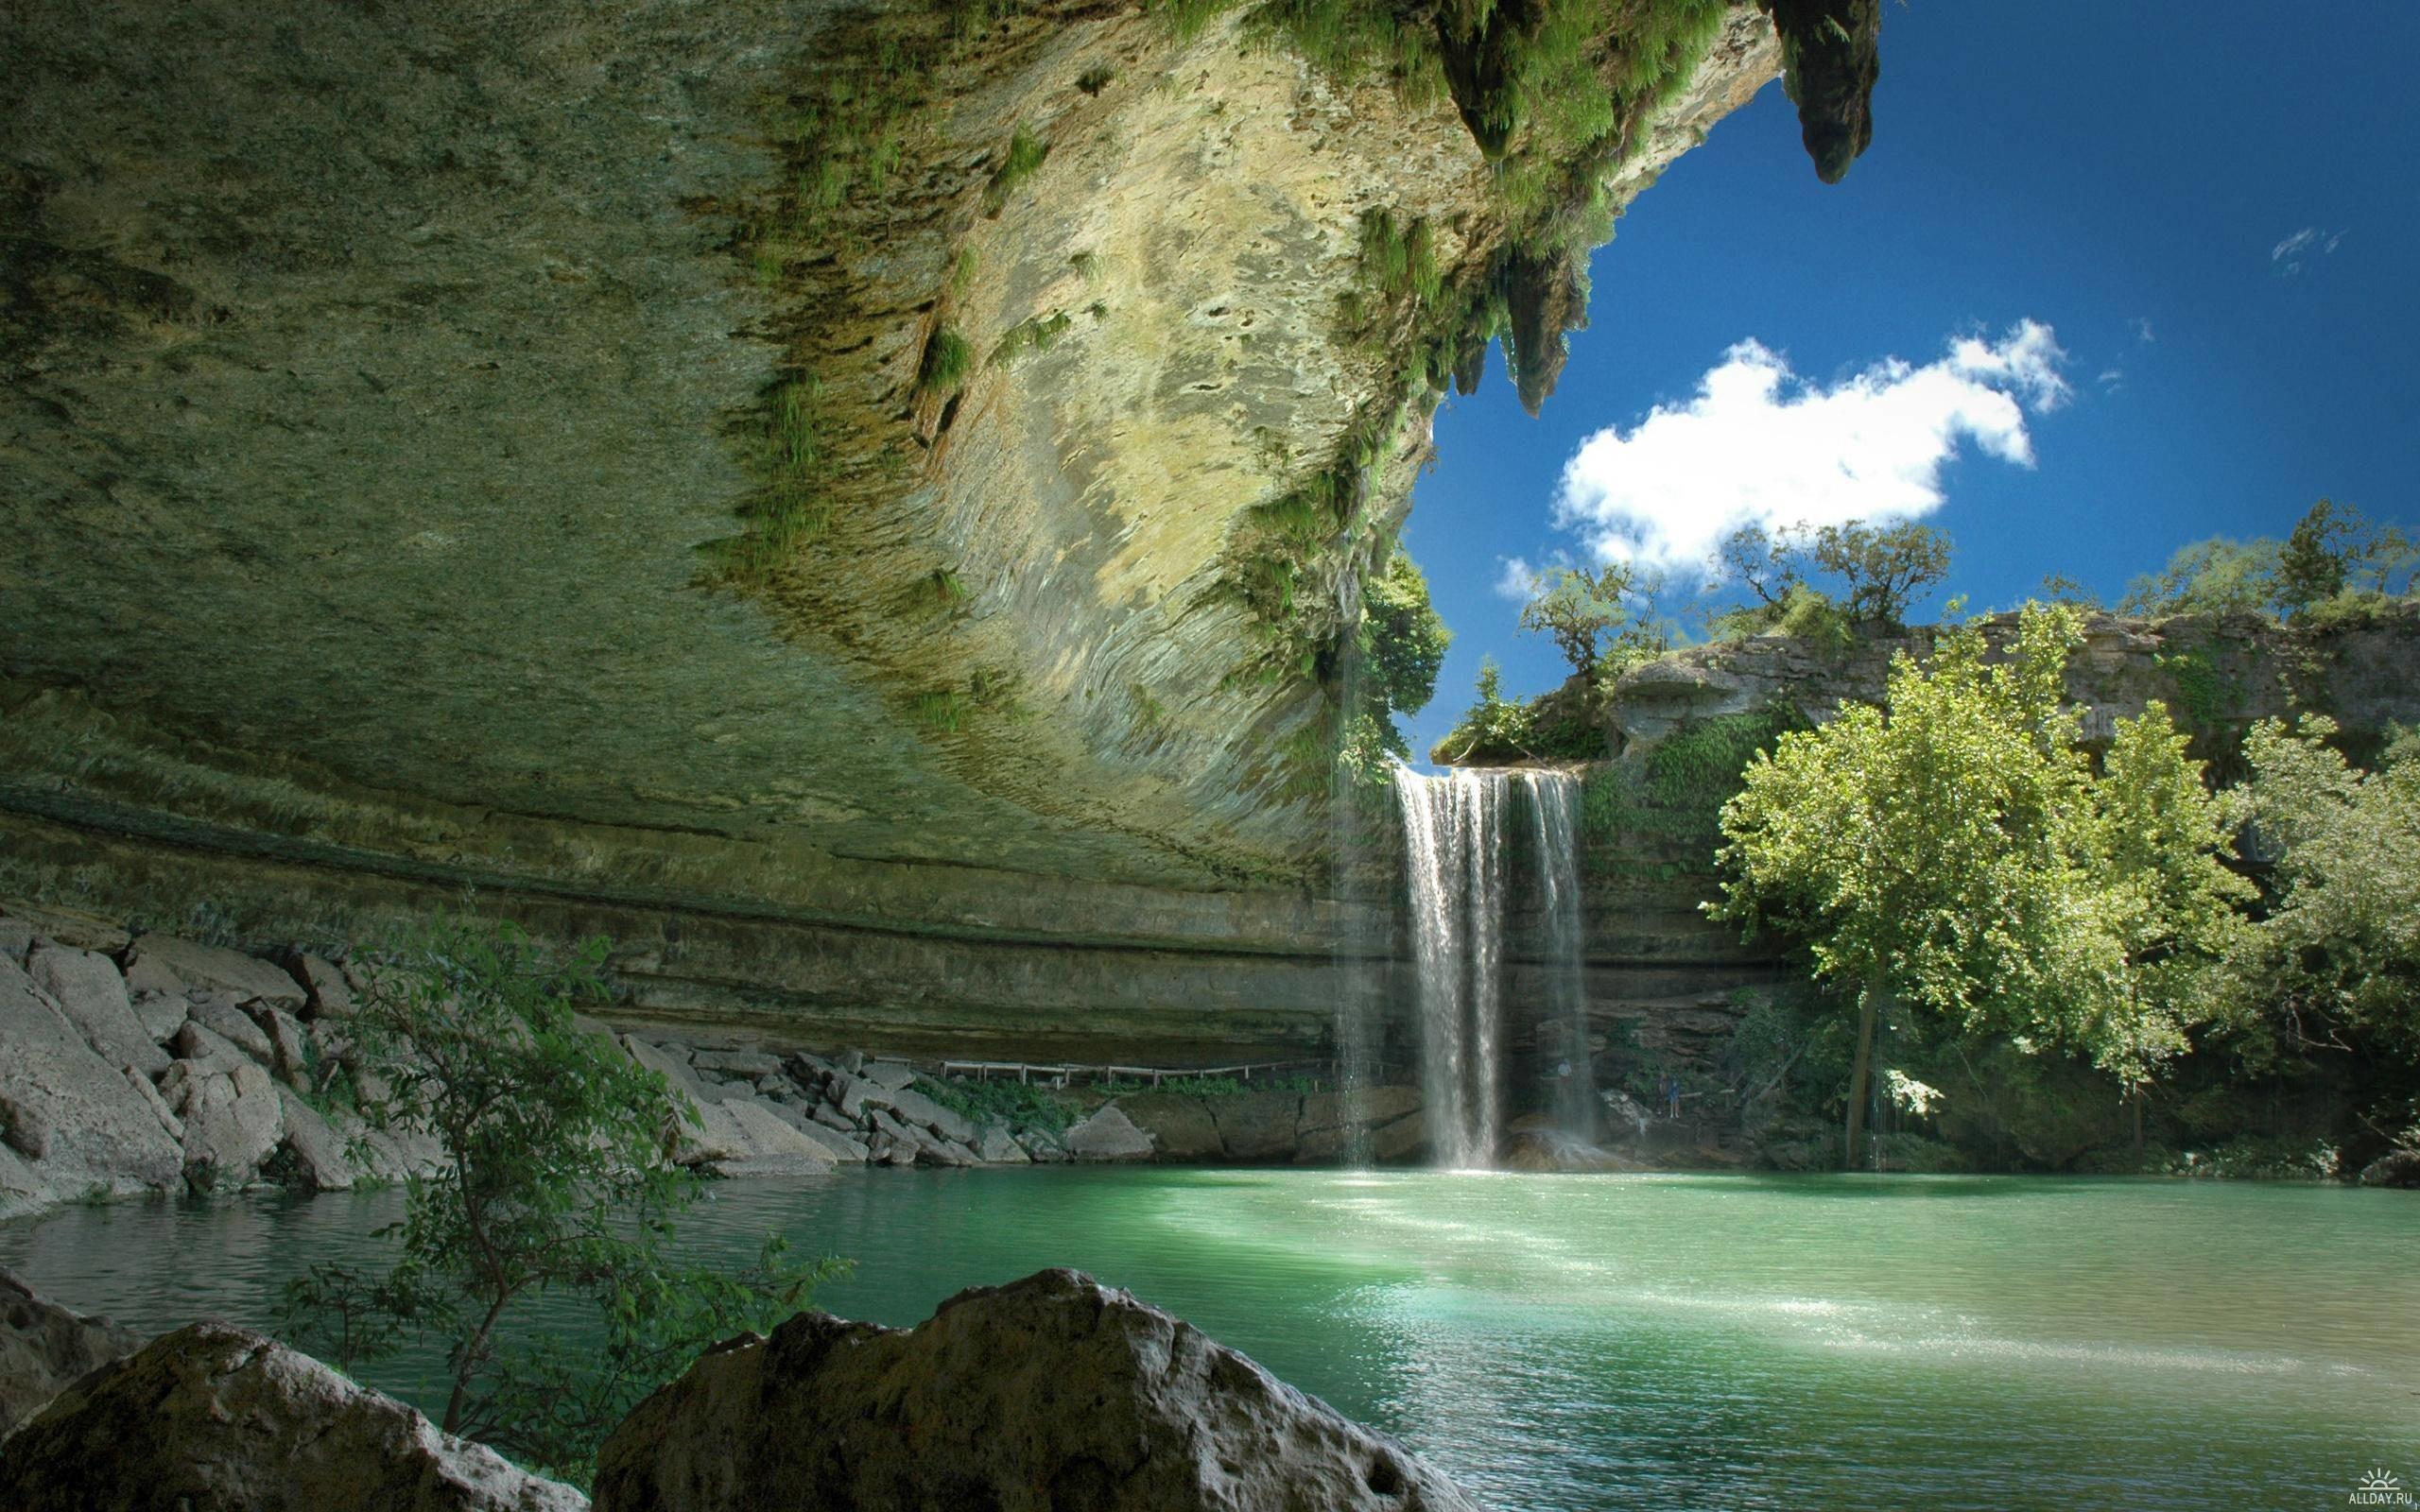 Waterfalls Wallpaper Free – Waterfall Wallpapers – HD Wallpapers 93537